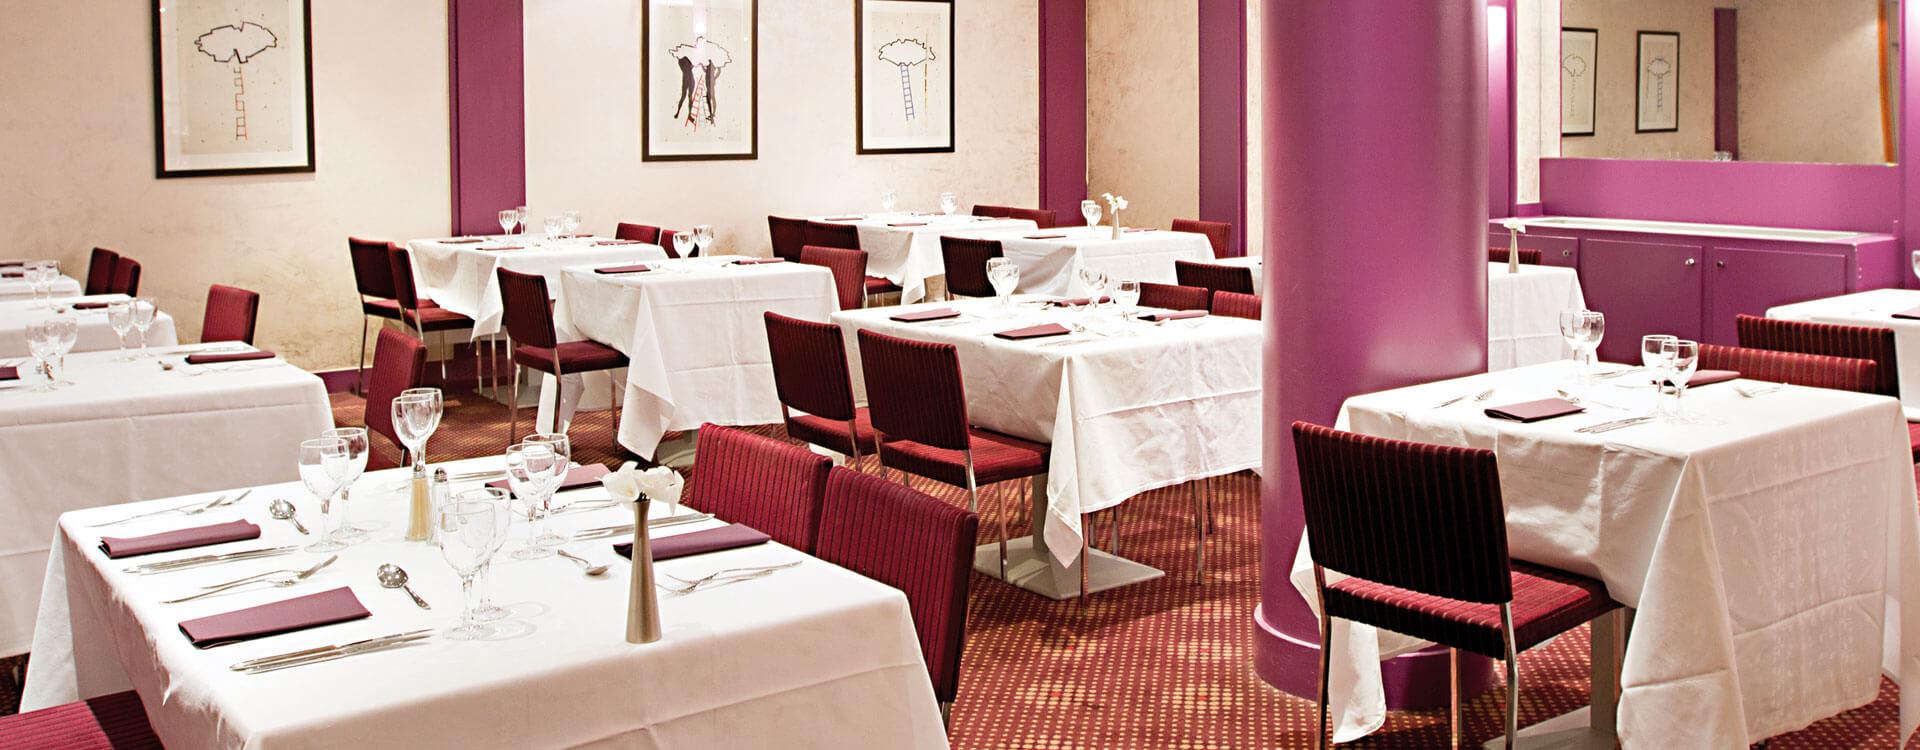 Restaurant - Hôtel*** Paris La Villa Modigliani